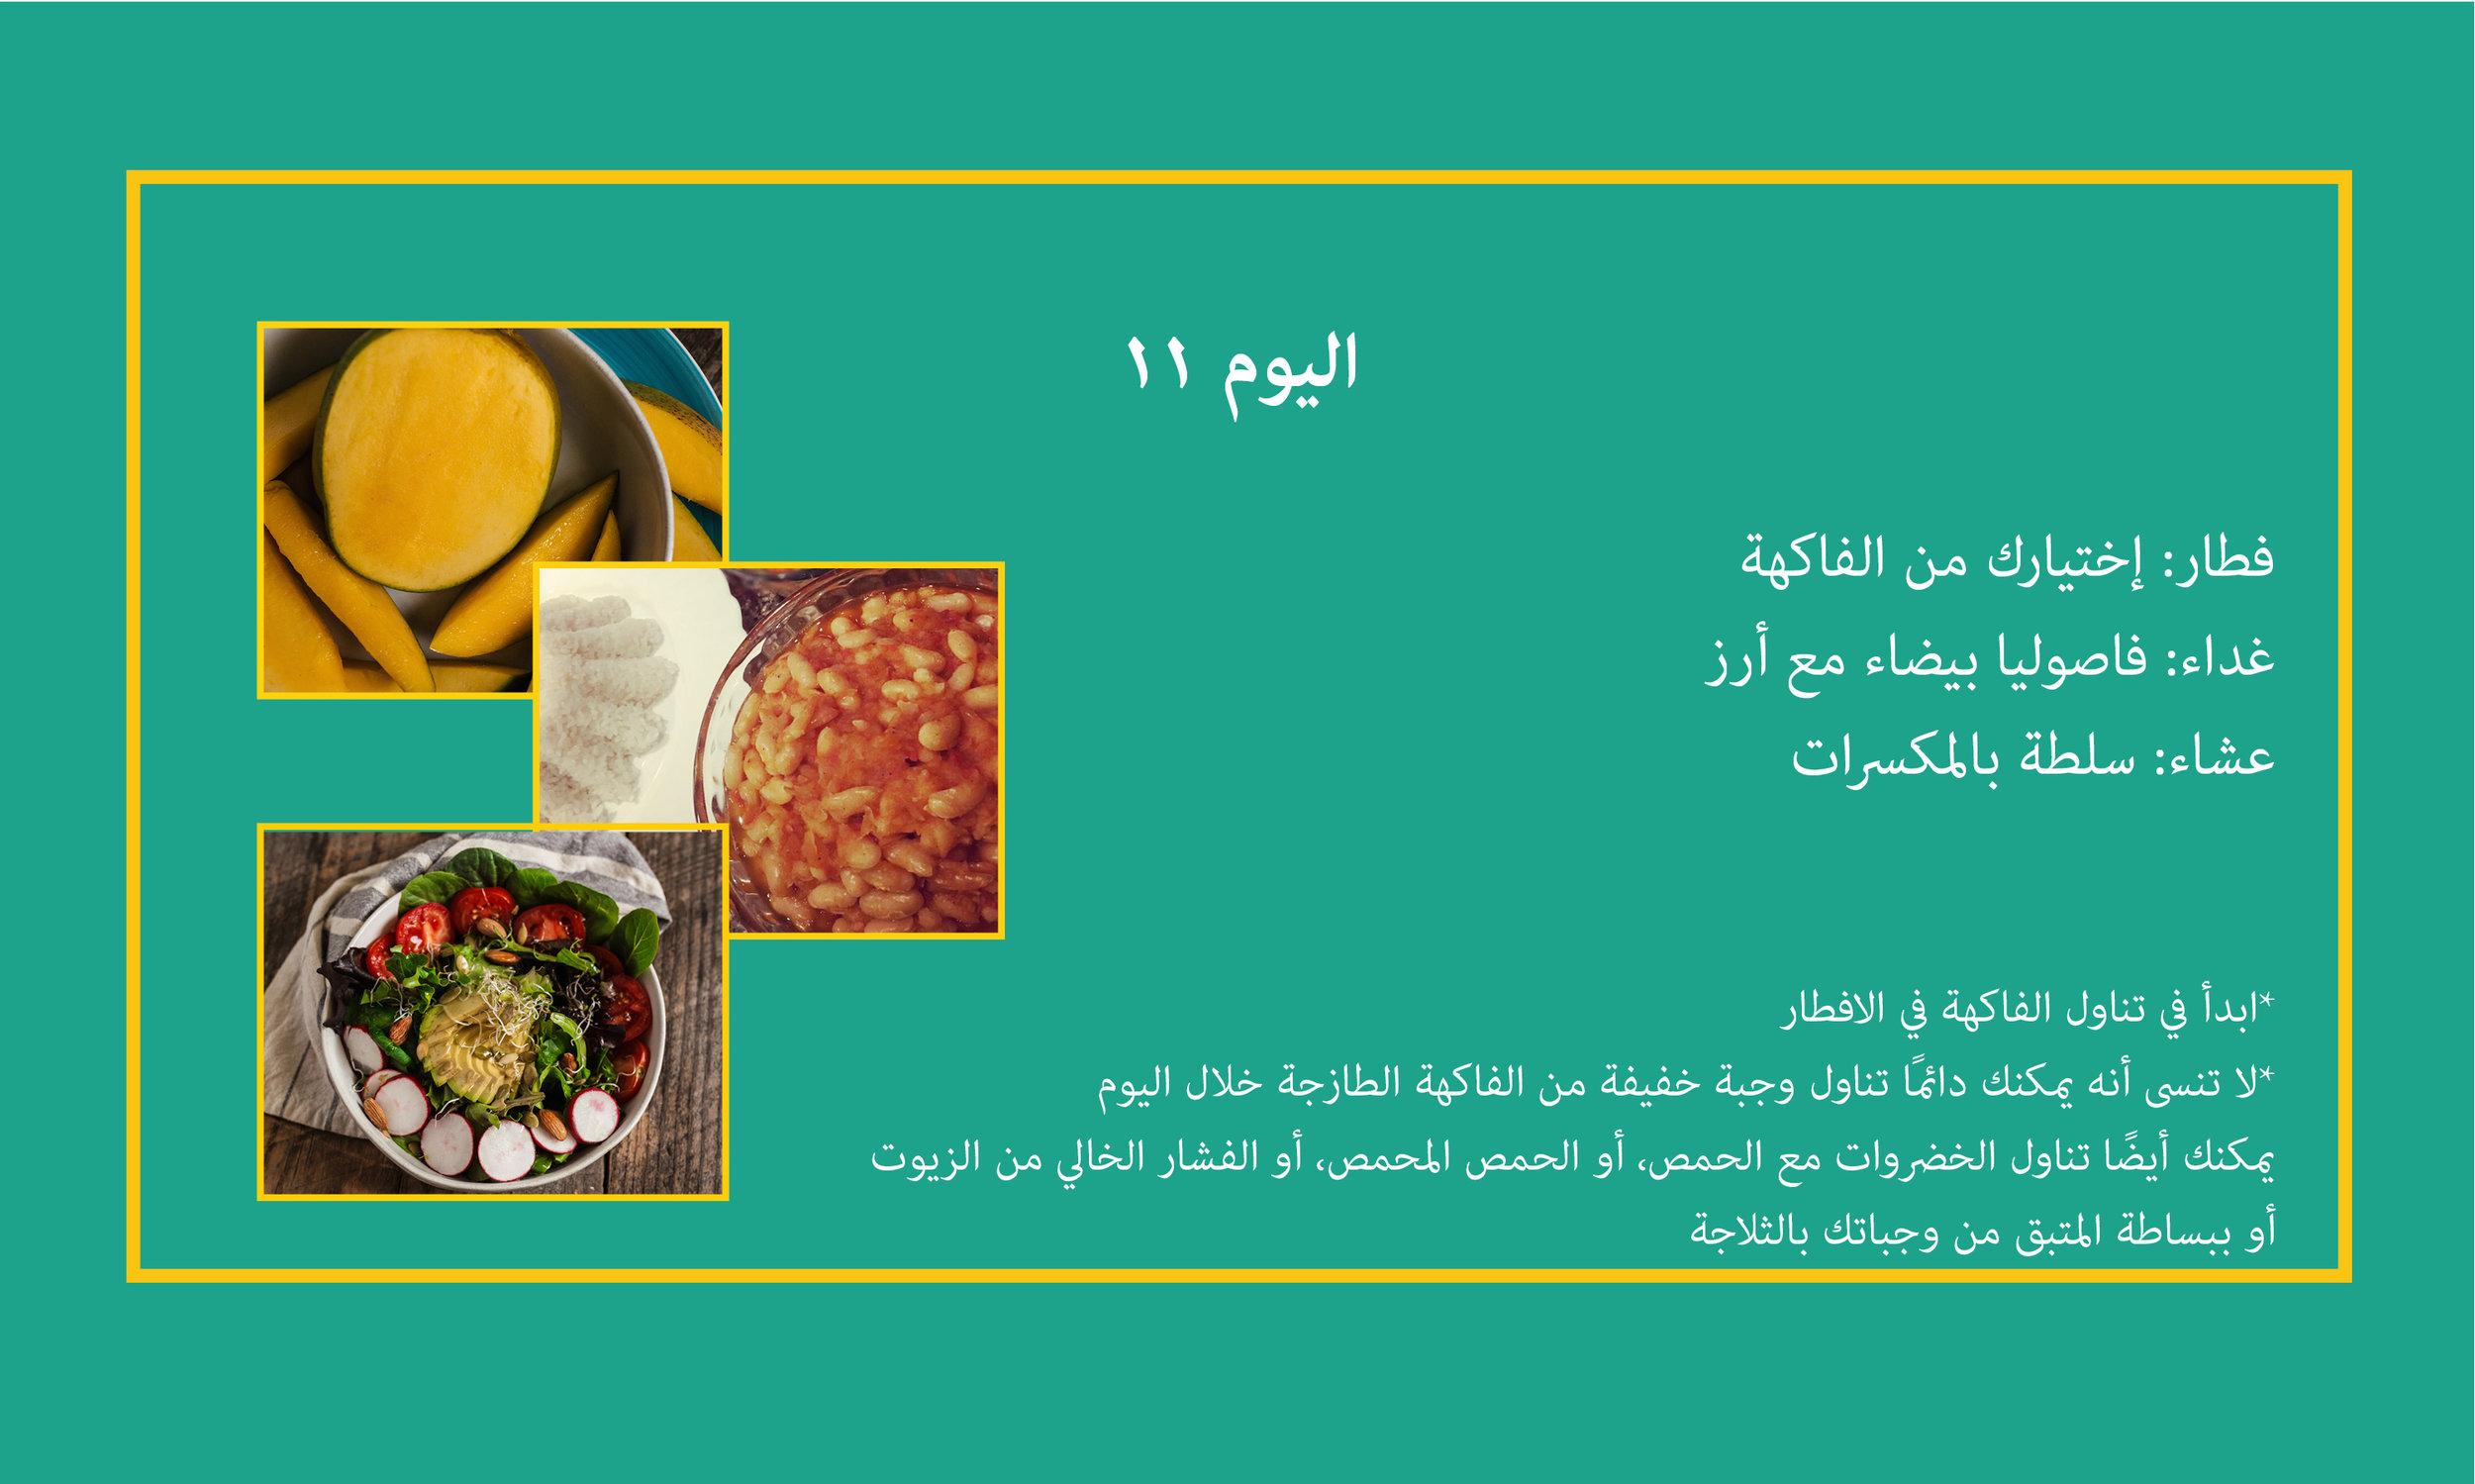 Day 11 Arabic.jpg